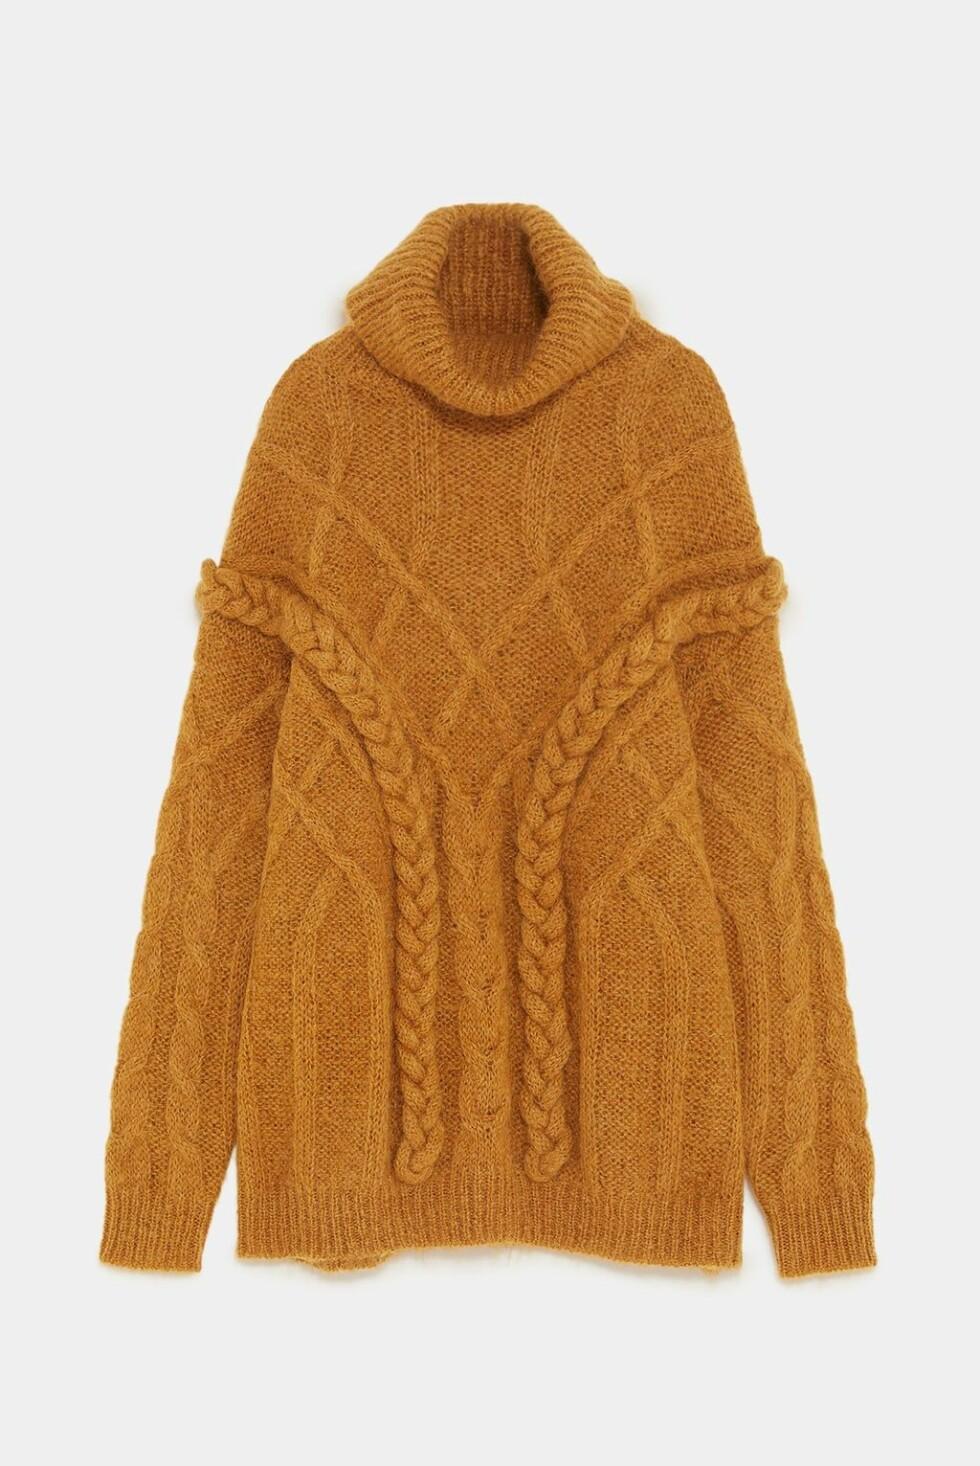 Genser fra Zara |650,-| https://www.zara.com/no/no/genser-med-flettem%C3%B8nster-limited-edition-p02488106.html?v1=6645125&v2=1074660